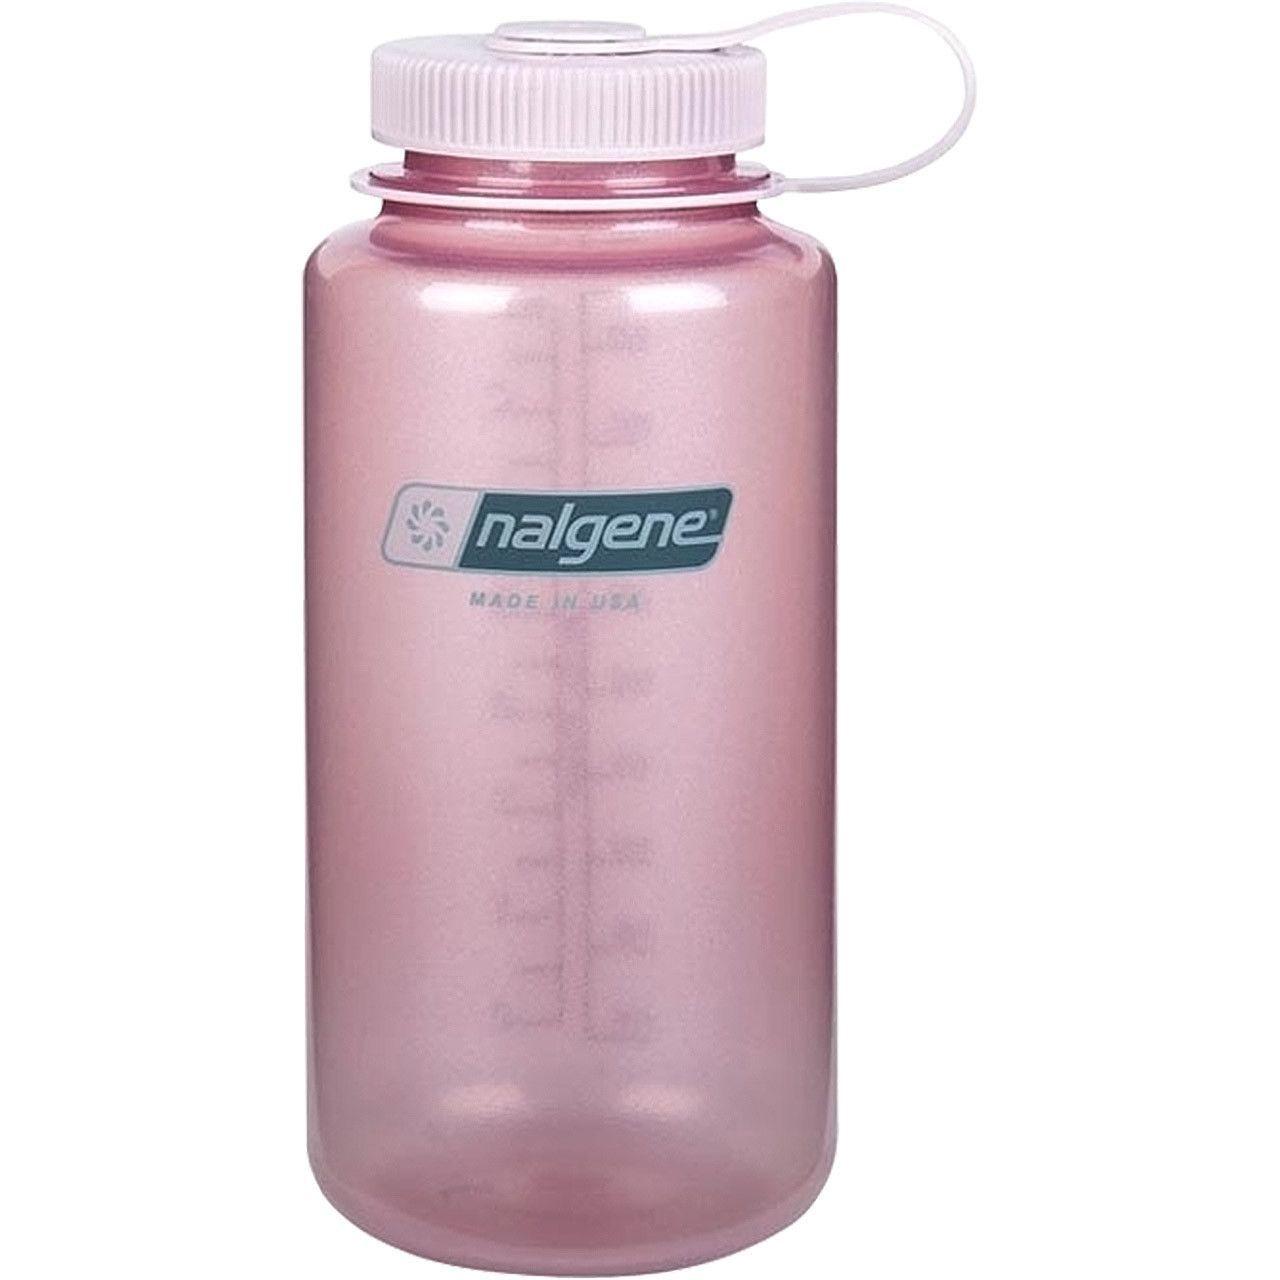 Nalgene Everyday Wide Mouth 32 Ounce Water Bottle Nalgene Bottle Wide Mouth Water Bottle Water Bottle Free